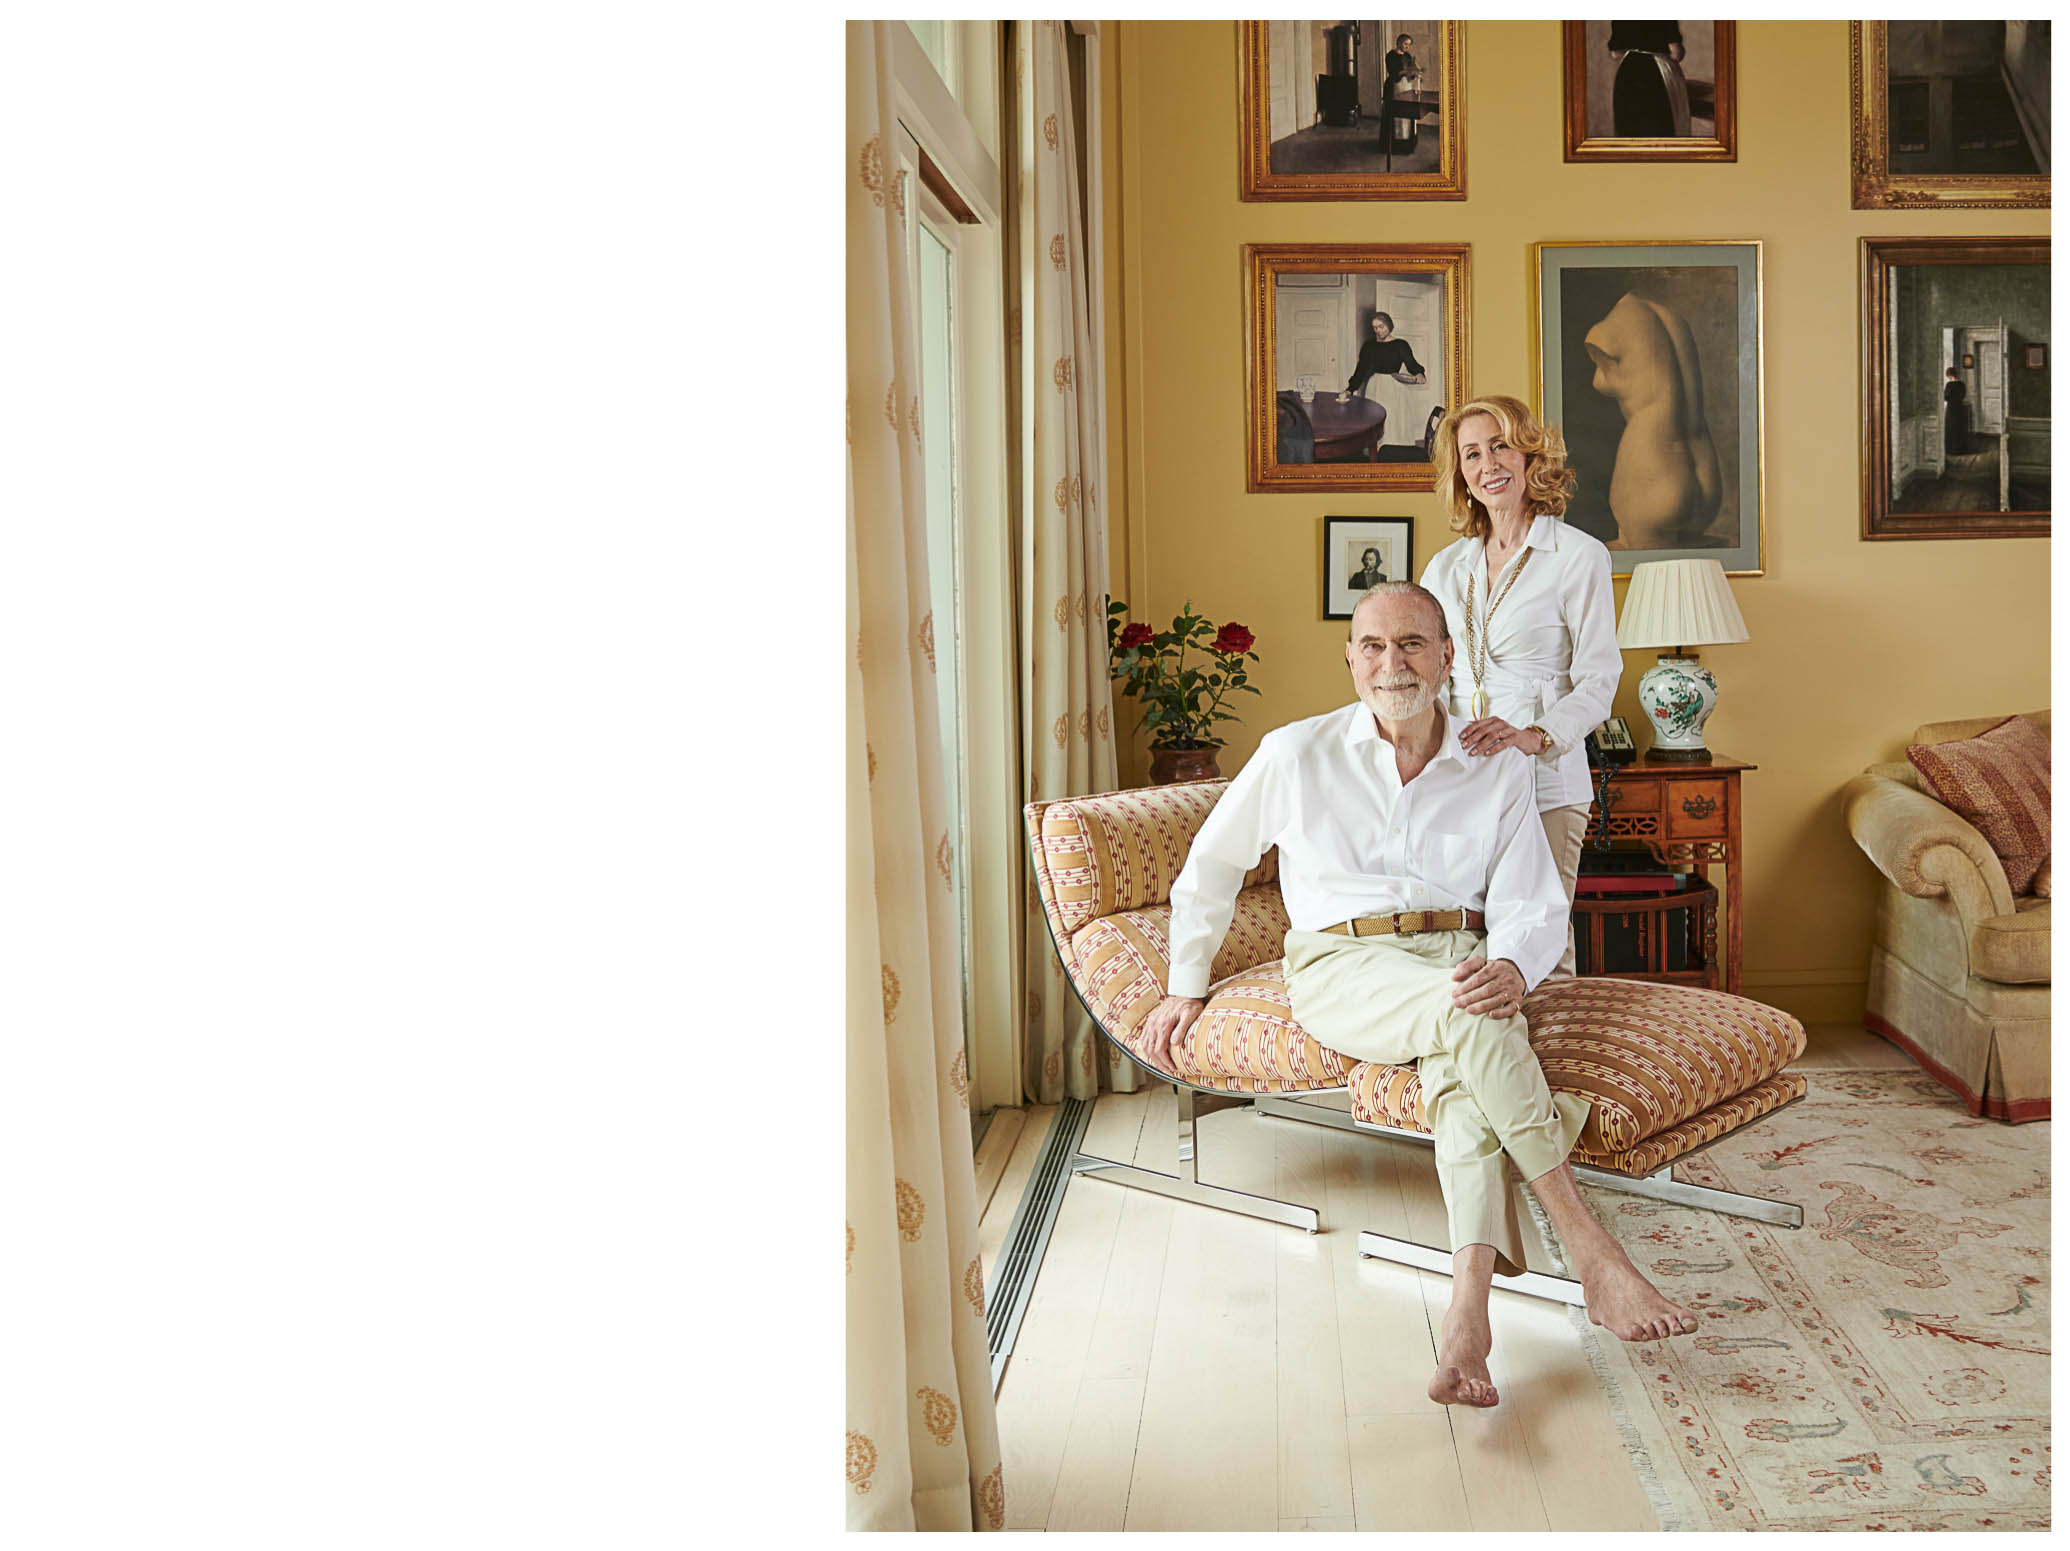 John Loeb and Sharon Handler Loeb